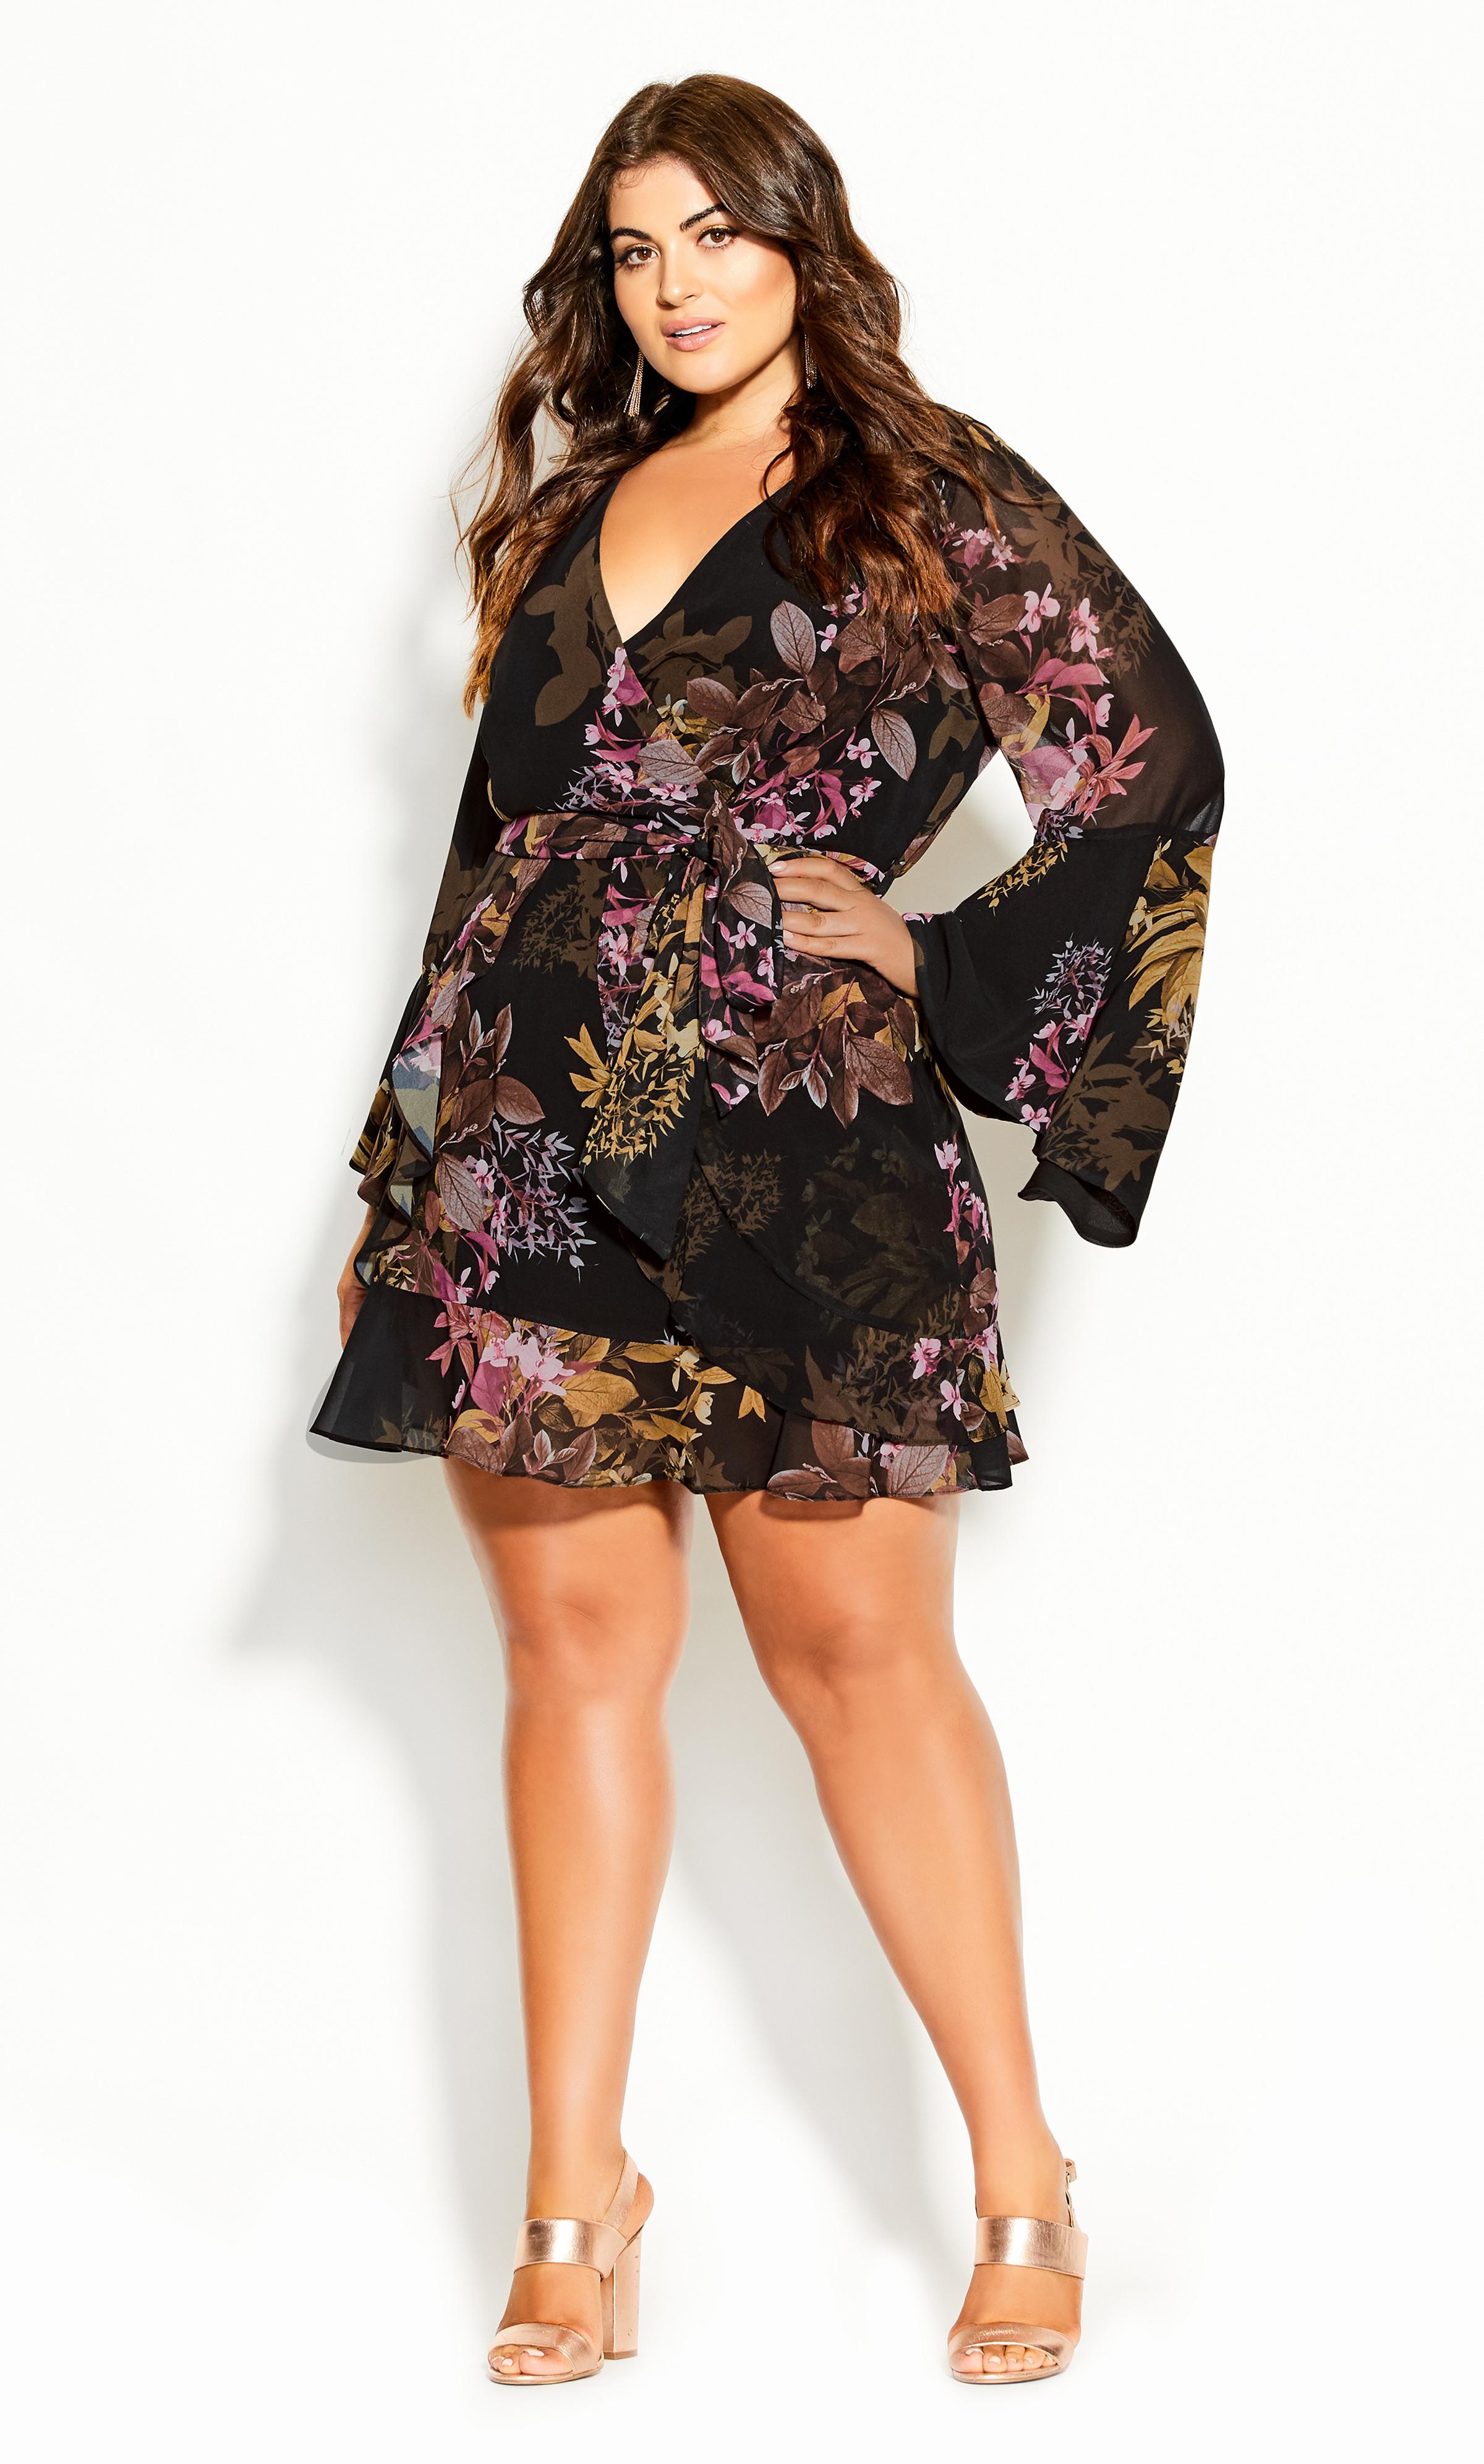 CASTALUNA LADIES FLORAL PRINTED DRESS BLACK SIZE 20 NEW ref 376